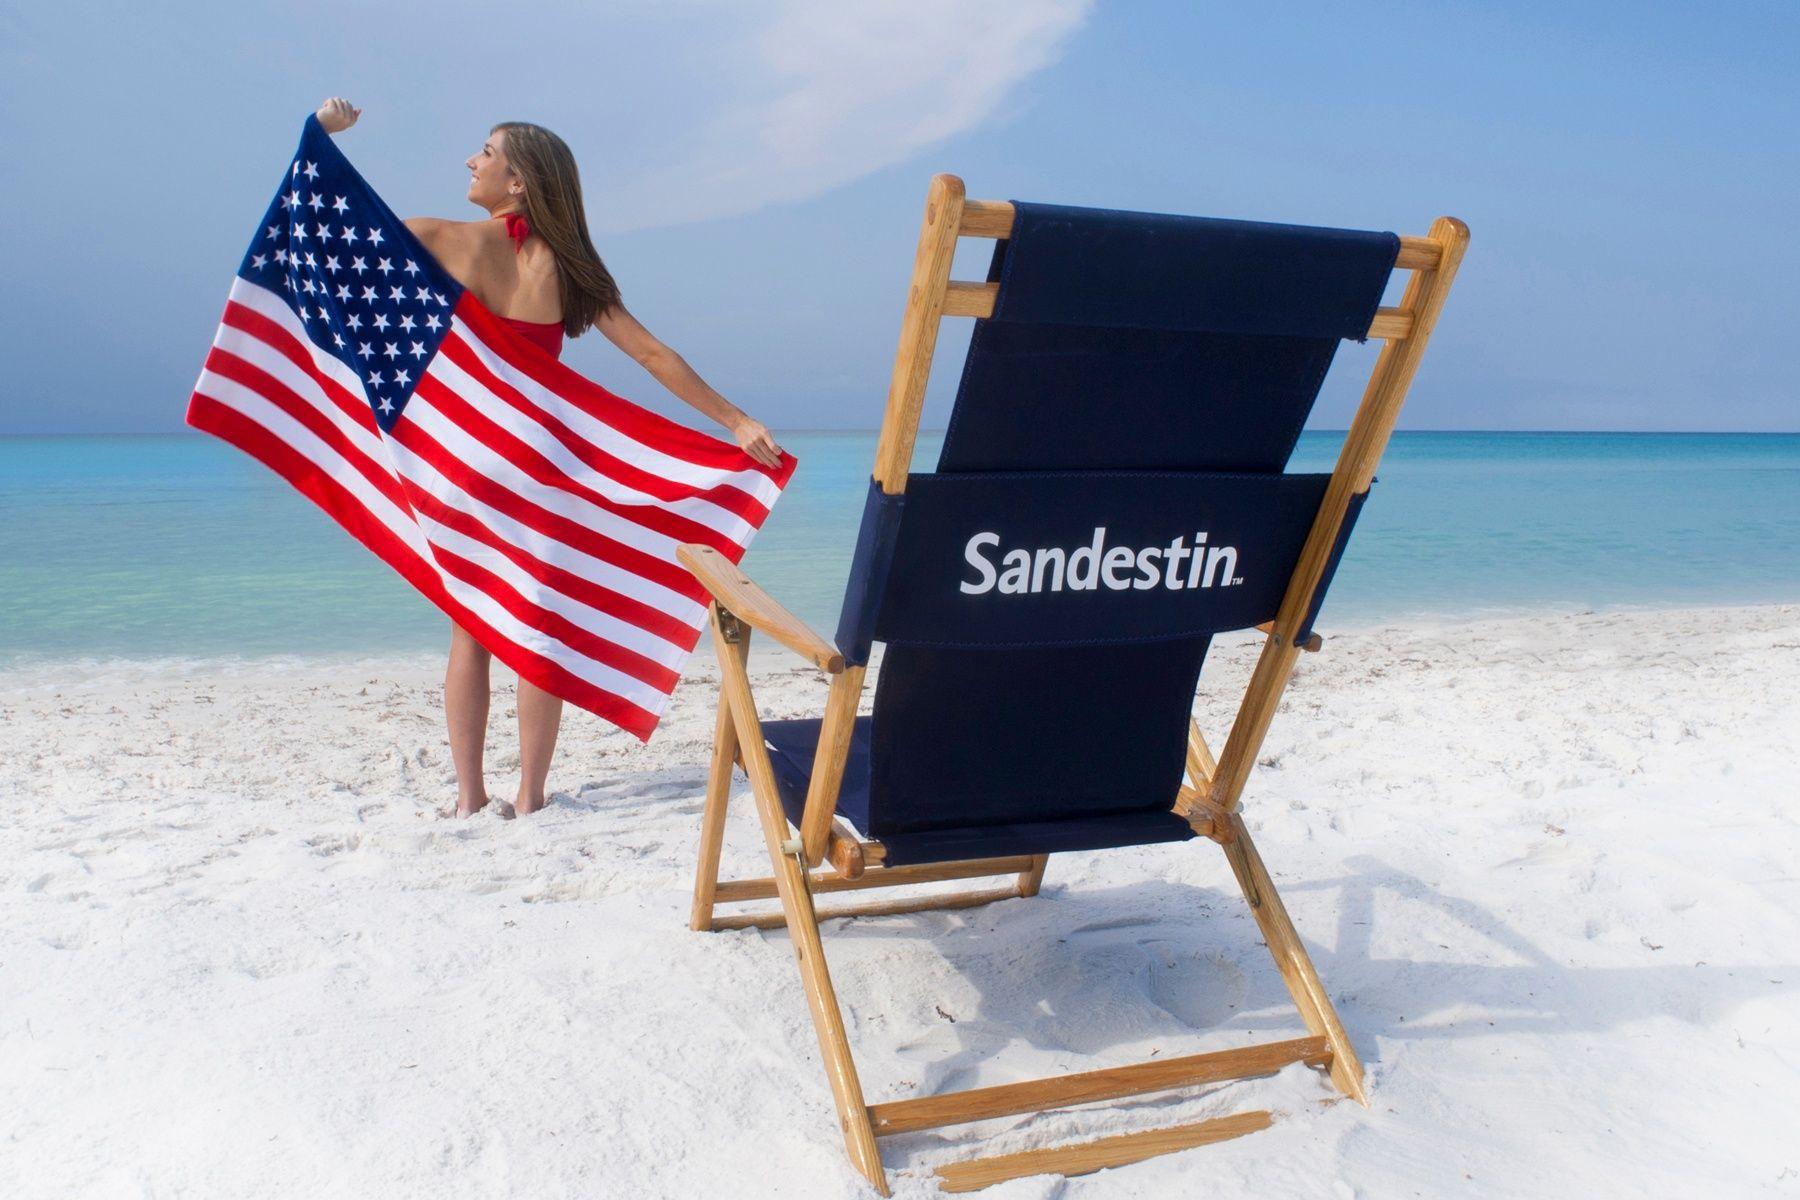 Memorial Day Weekend Best Summer Ever Destin Fl Sandestin Events Live Music To Do In Desti Sandestin Golf And Beach Resort Most Beautiful Beaches Visit Florida